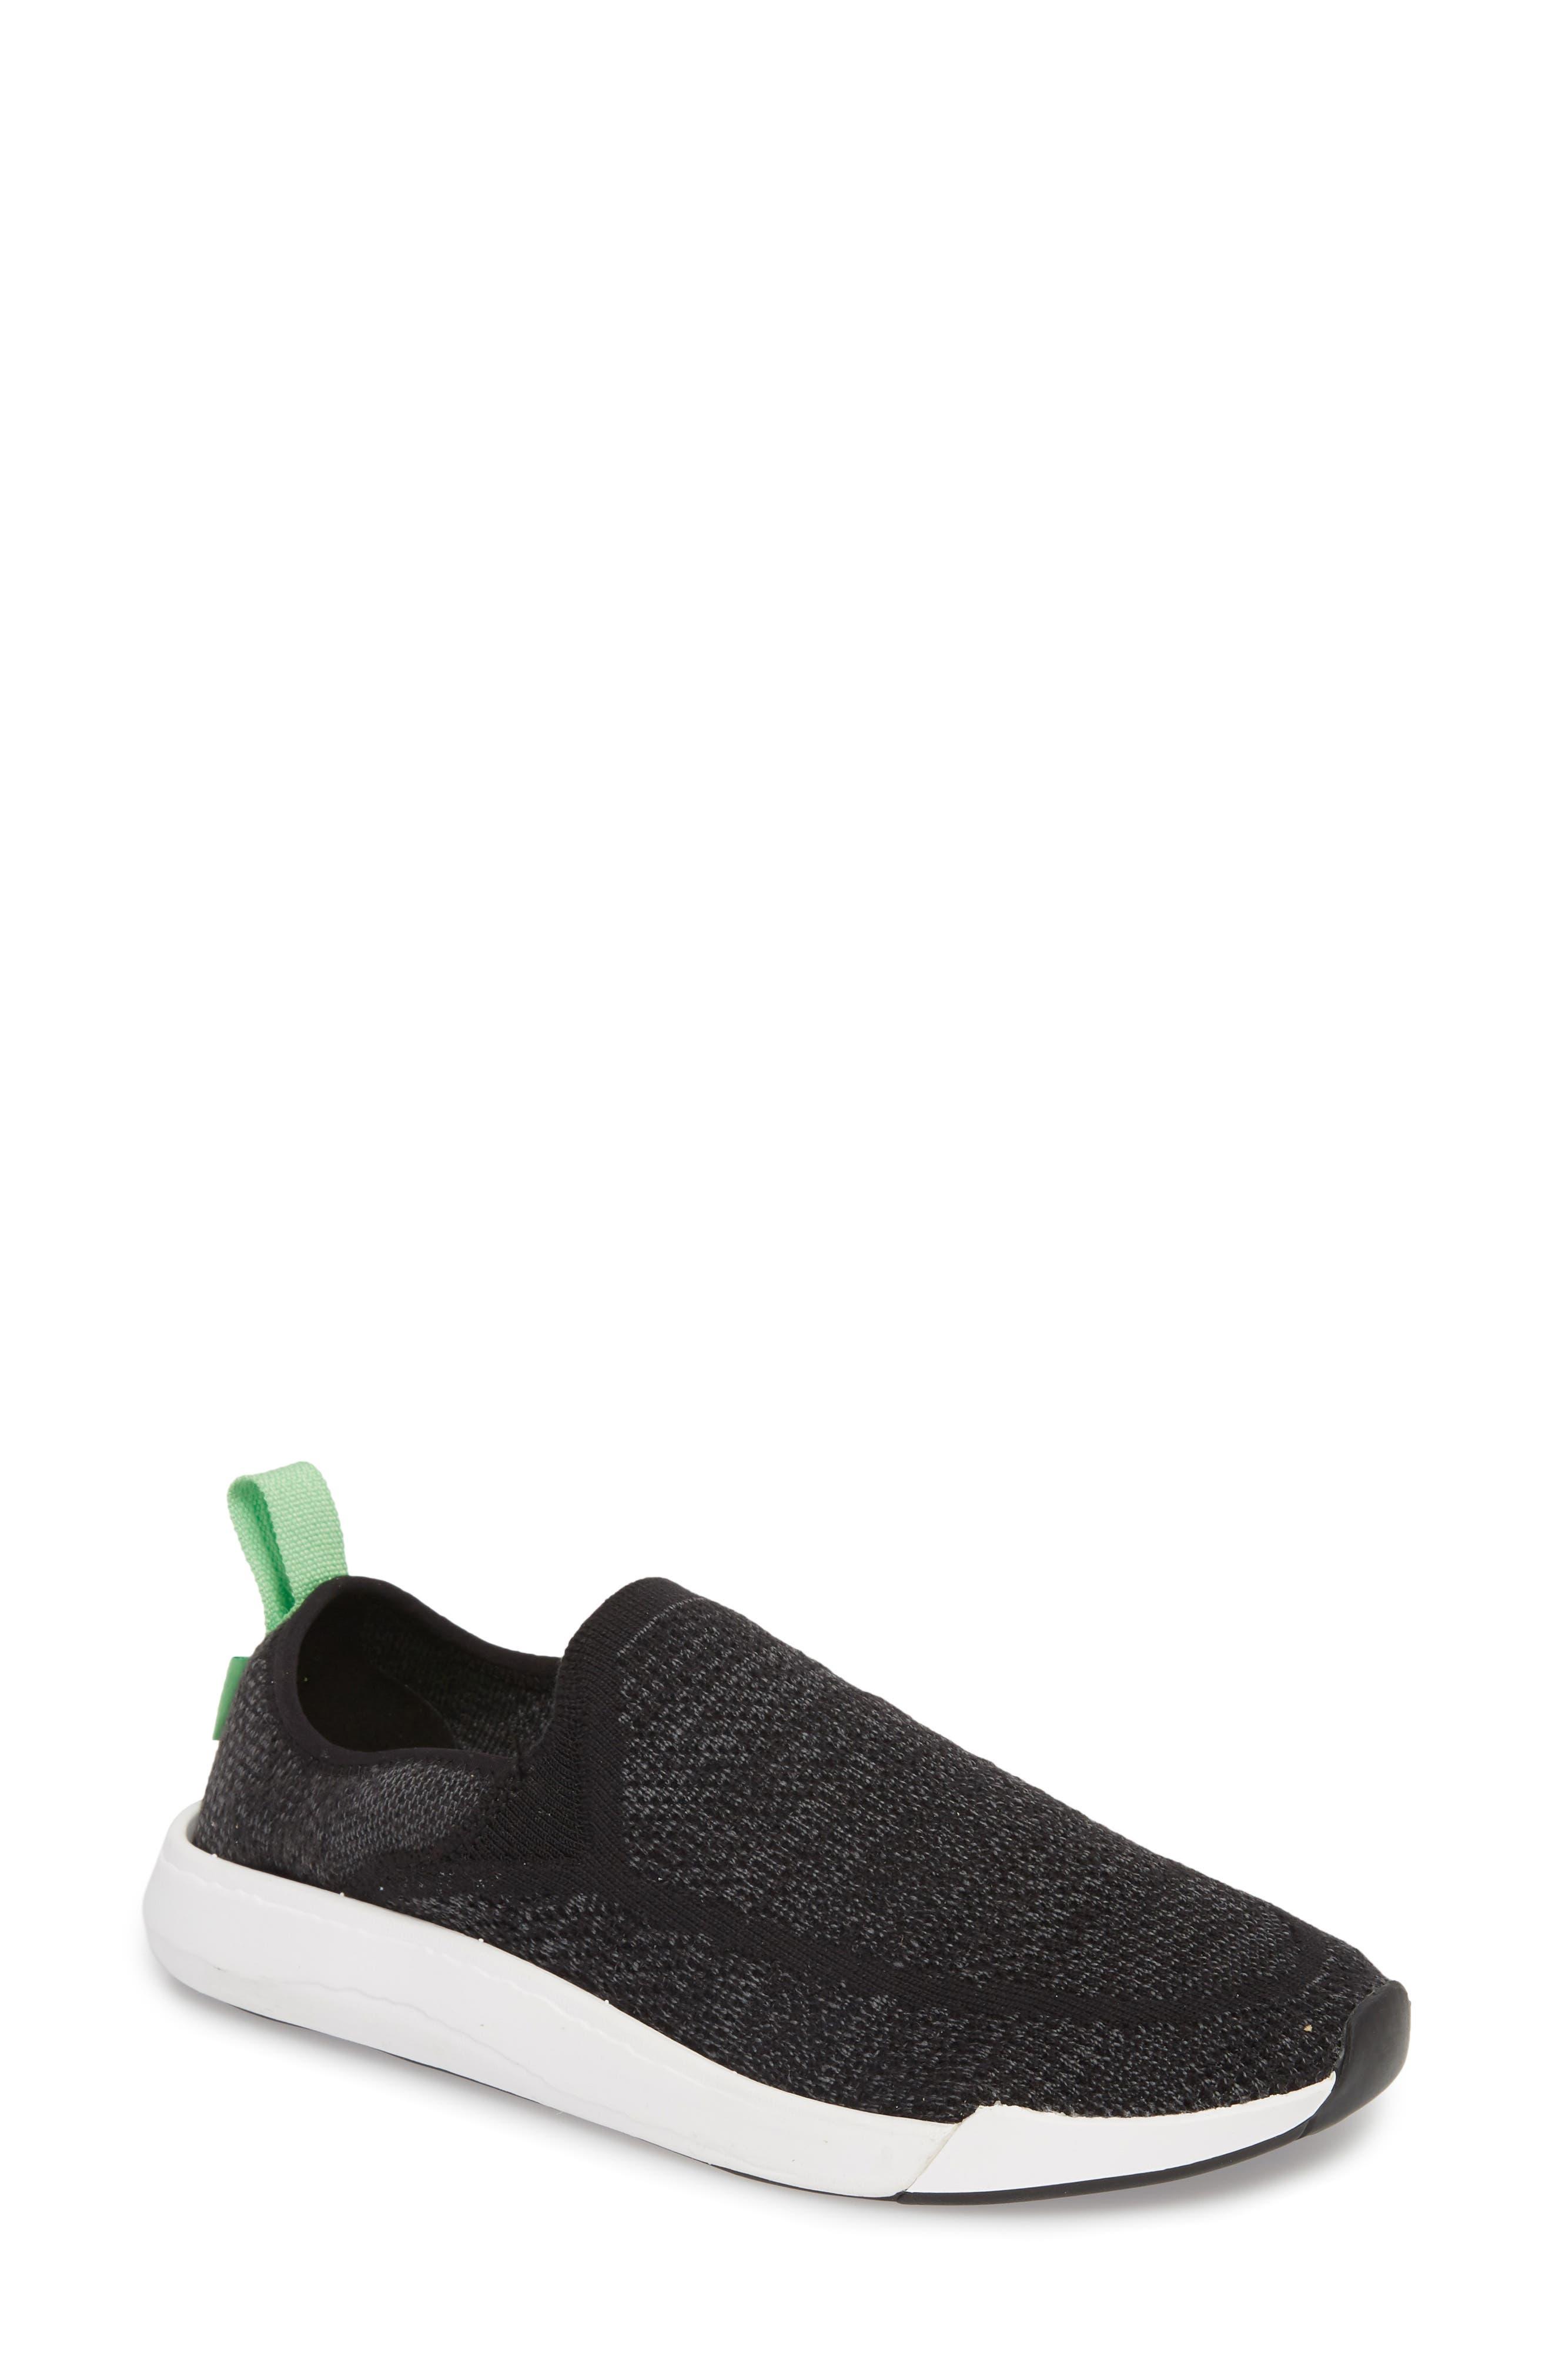 SANUK Chiba Quest Knit Slip-On Sneaker, Main, color, BLACK